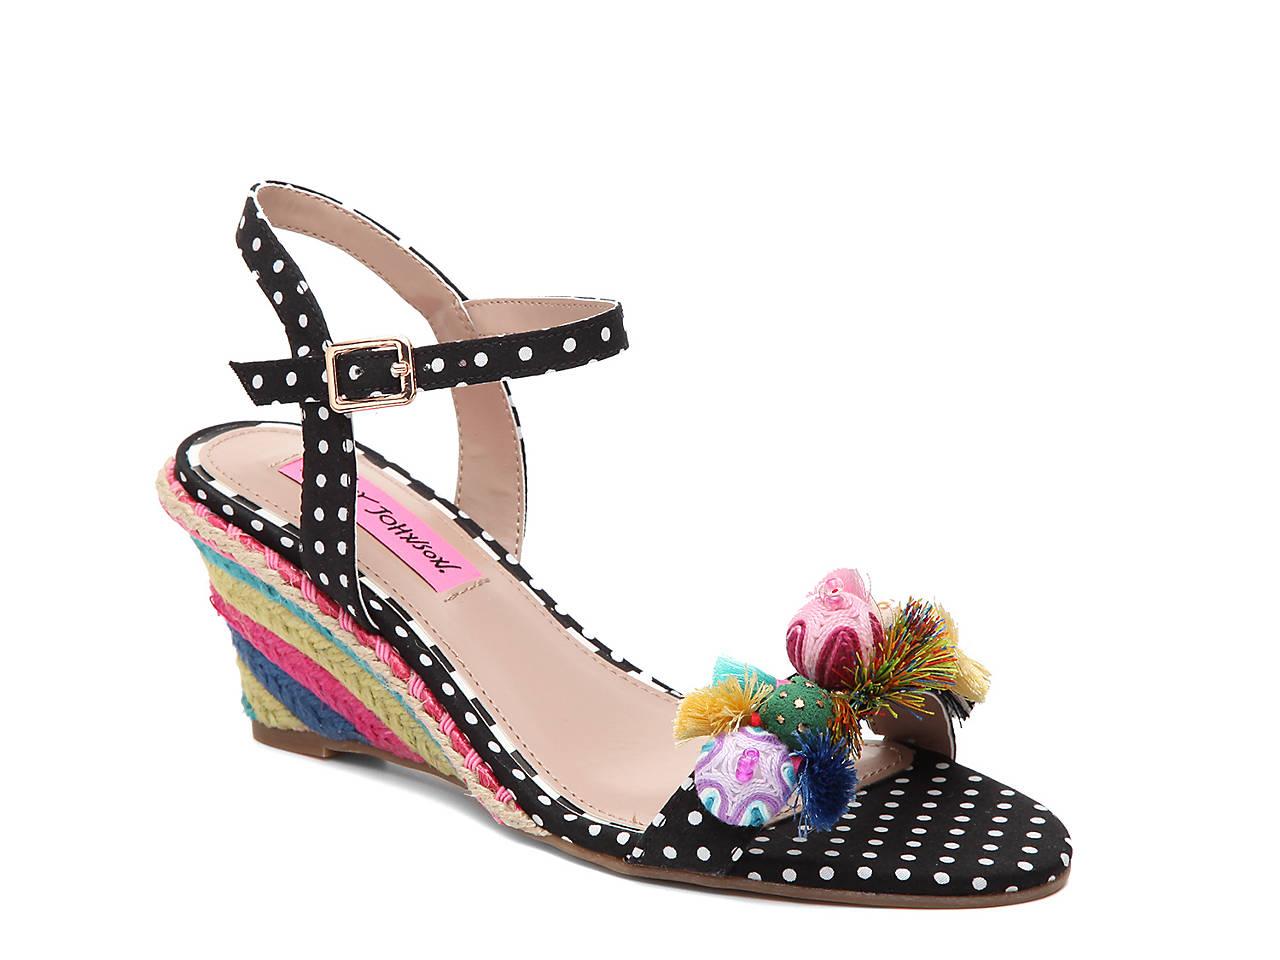 f424b422e87 Koko Espadrille Wedge Sandal